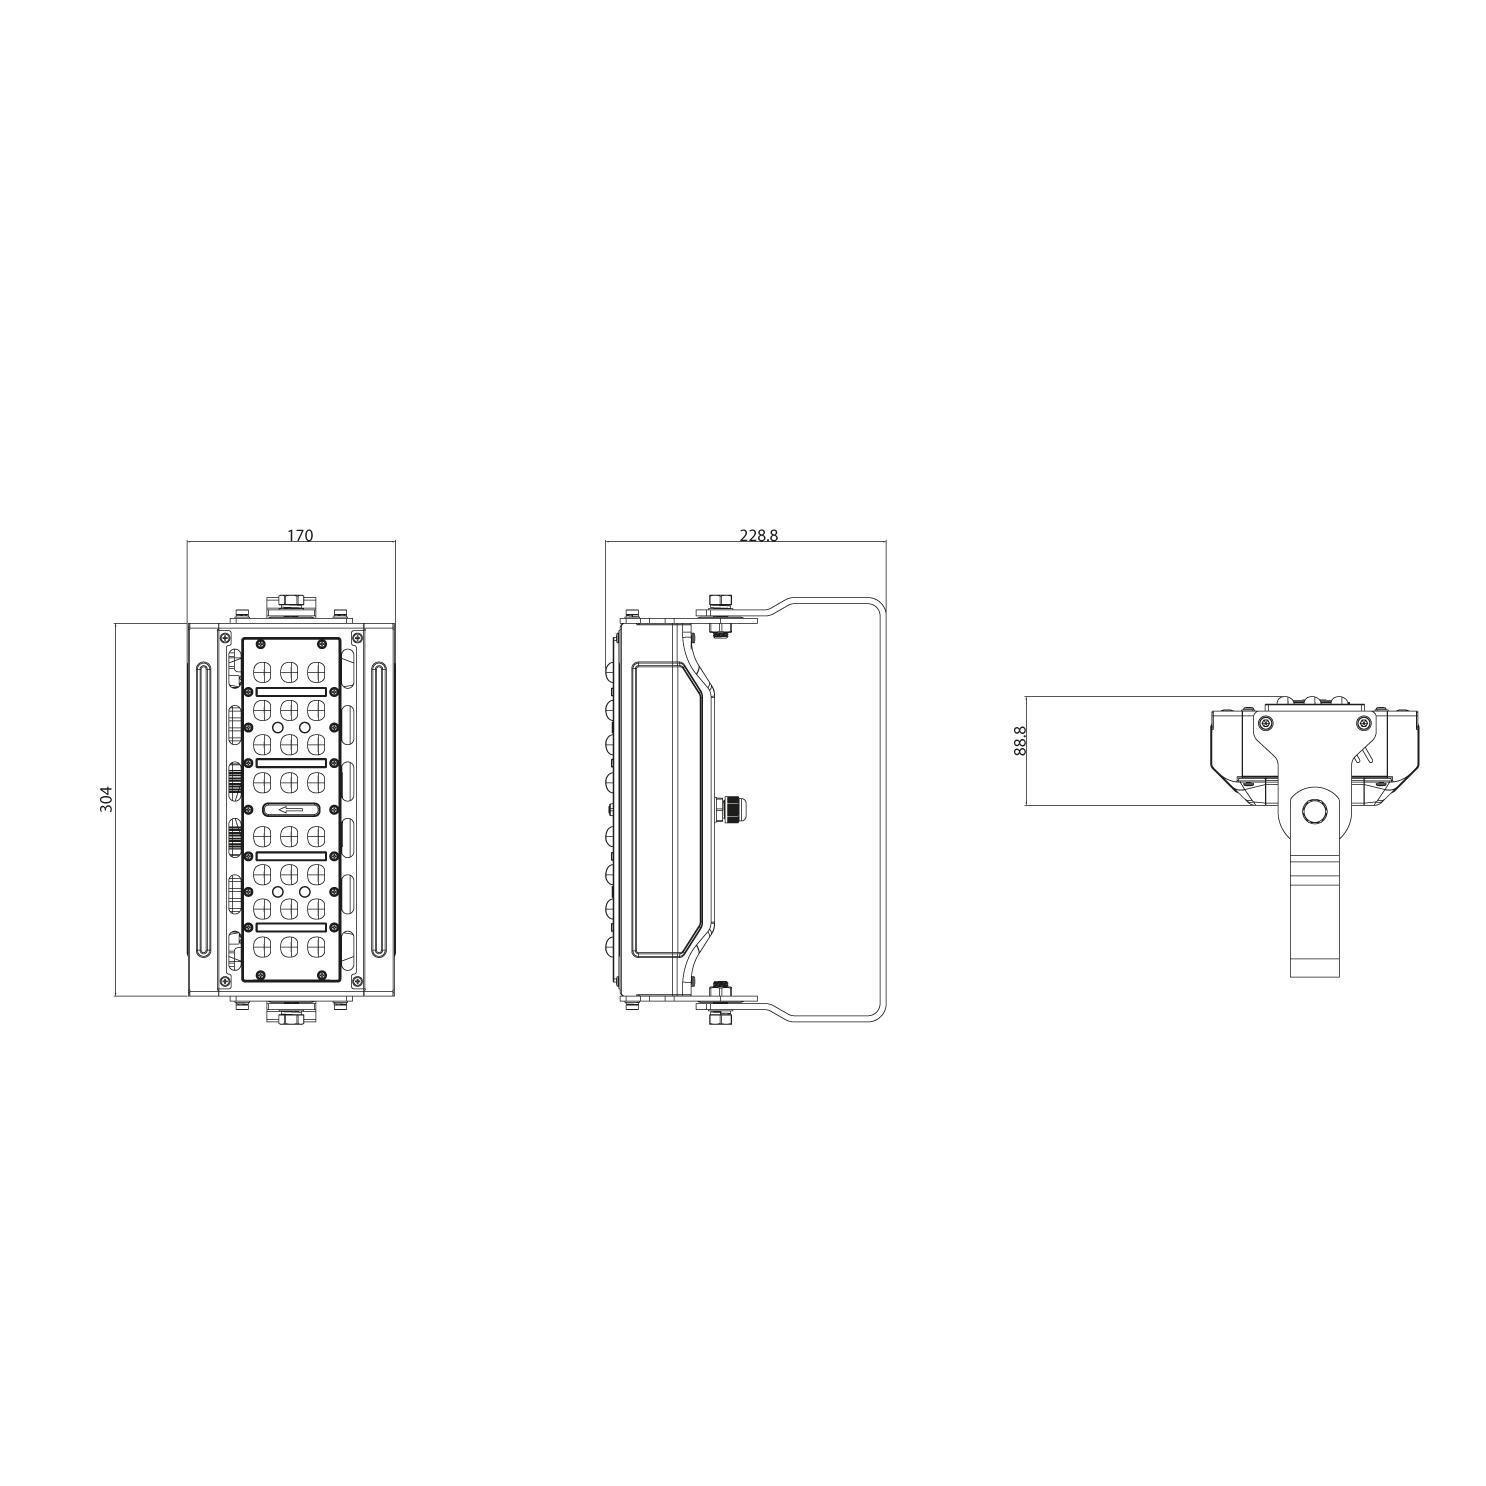 tags: #lights flood outdoor led 90000lumens#outdoor wall mount led lights# led light fixtures#120v led flood lights outdoor#best led flood light  bulb#outdoor